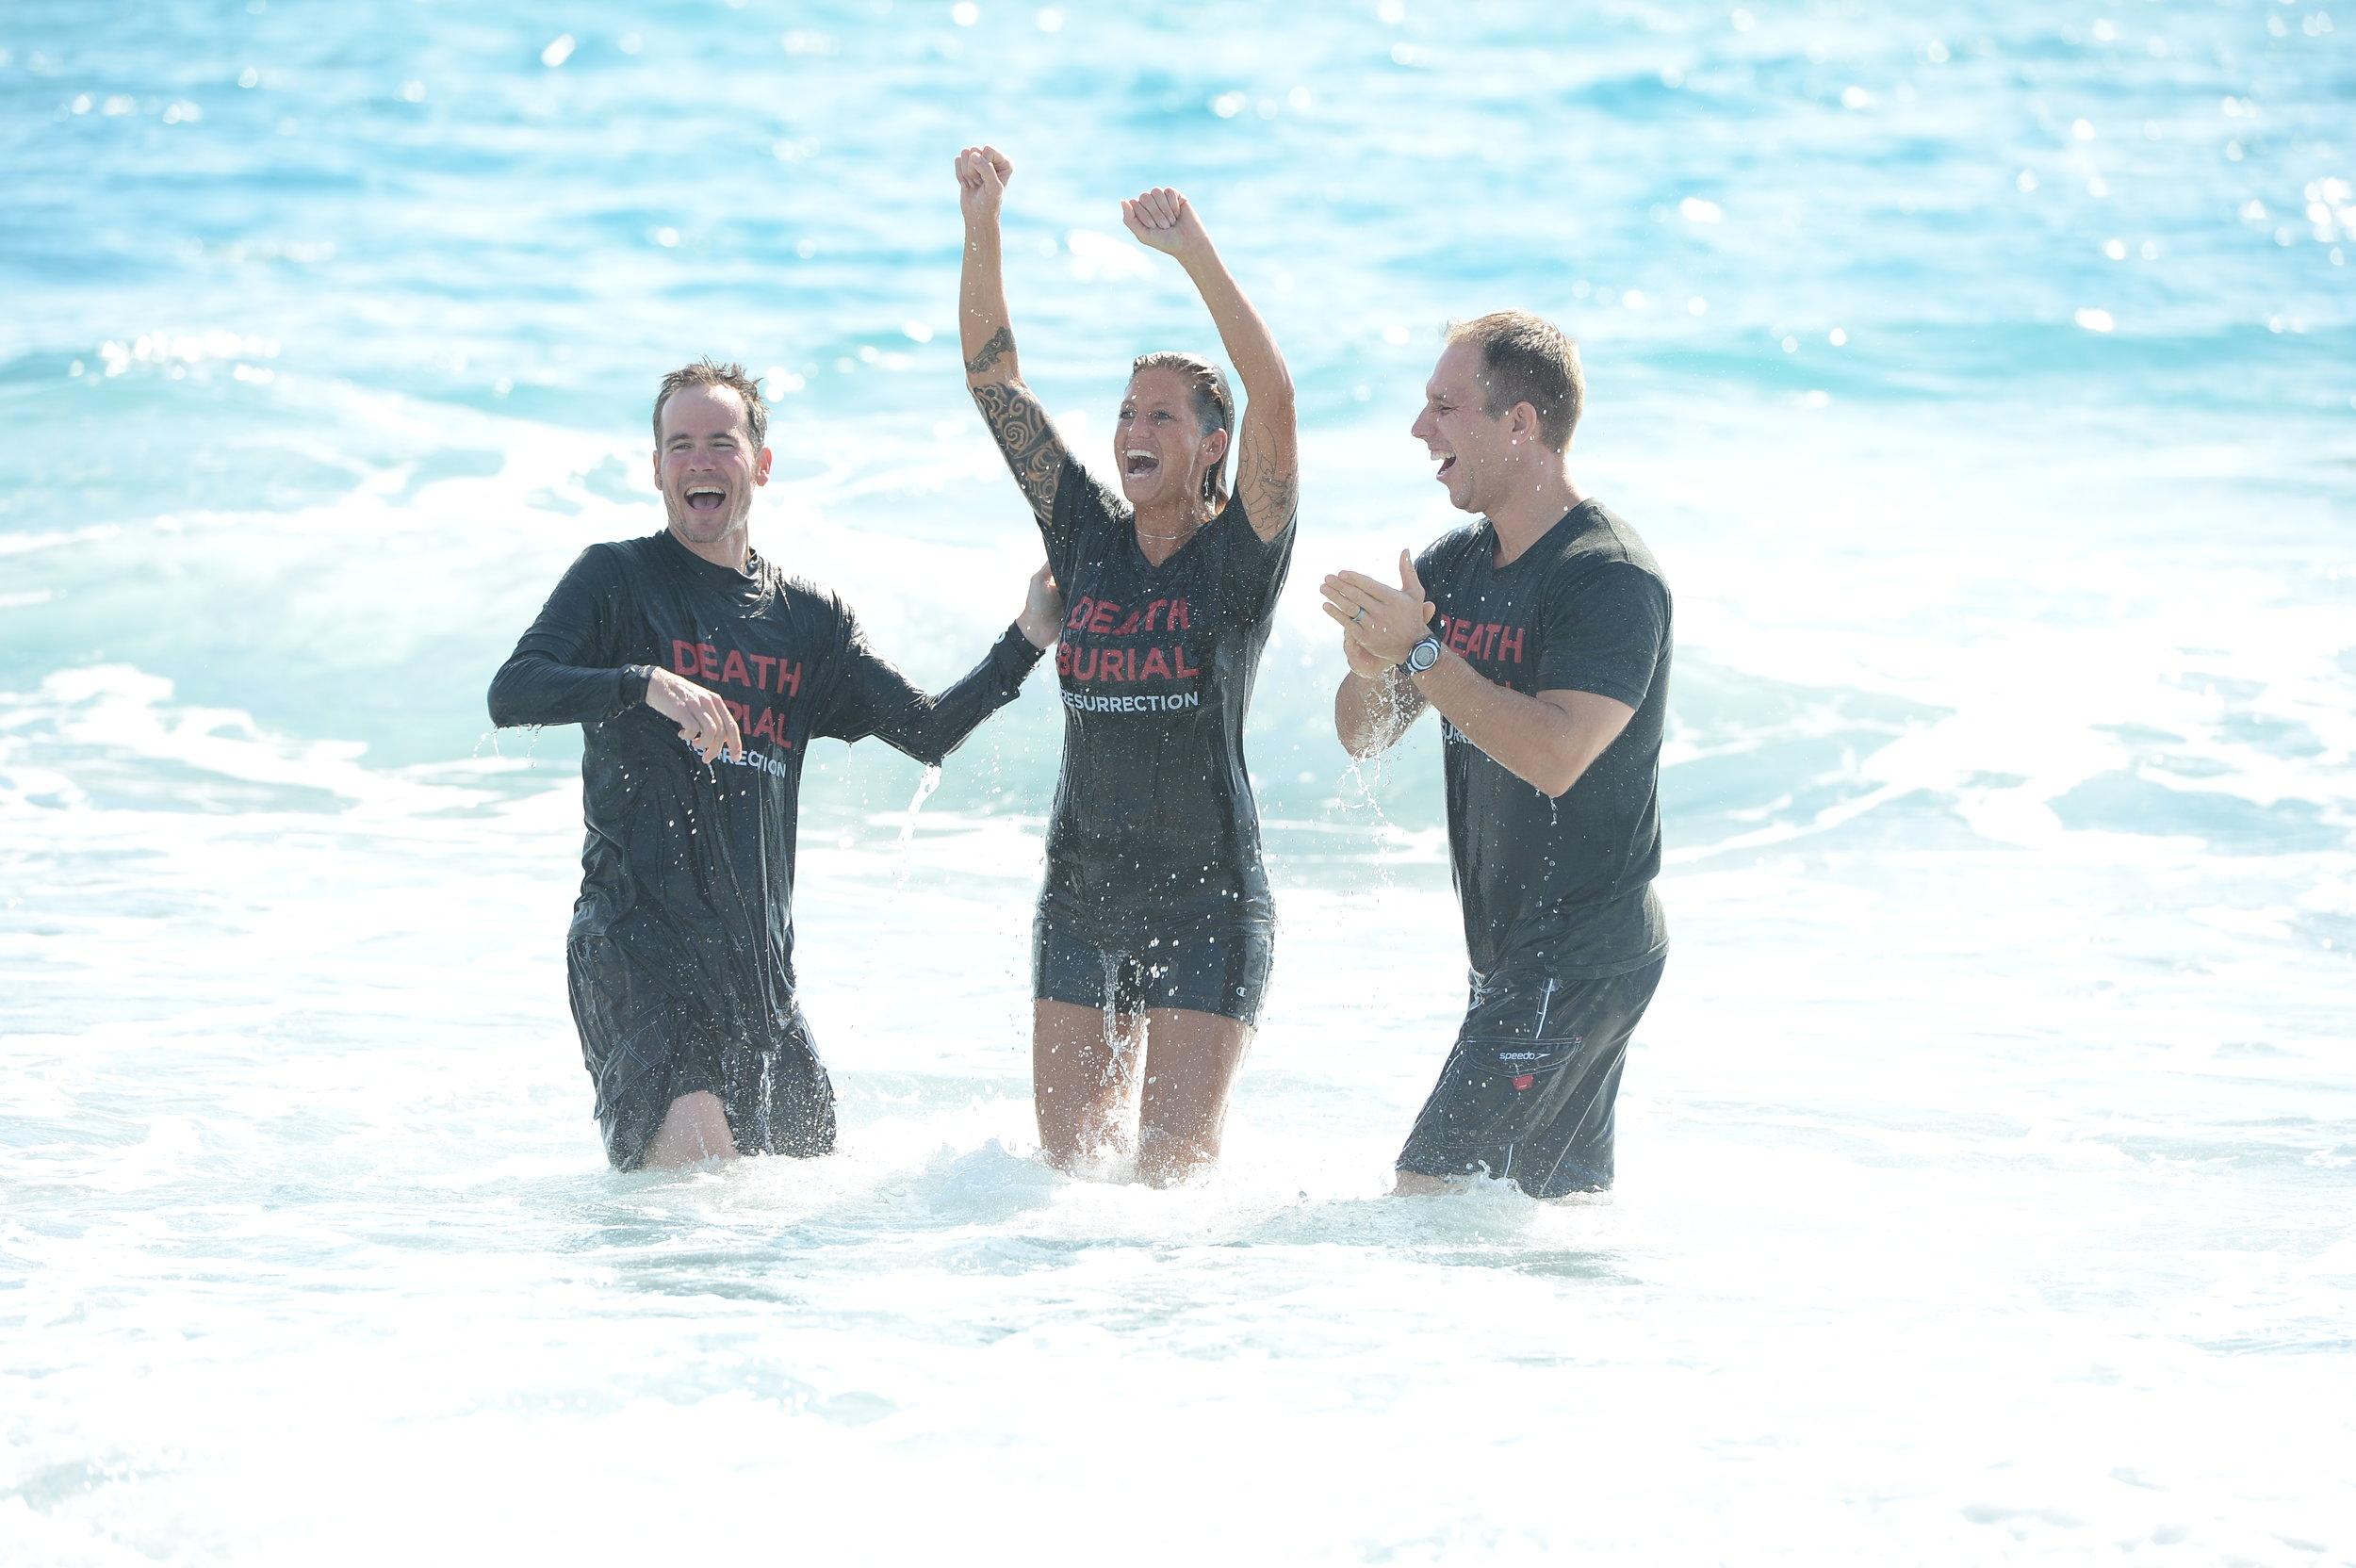 Baptism-2016-5c-APP-EVENT-400x400.jpg